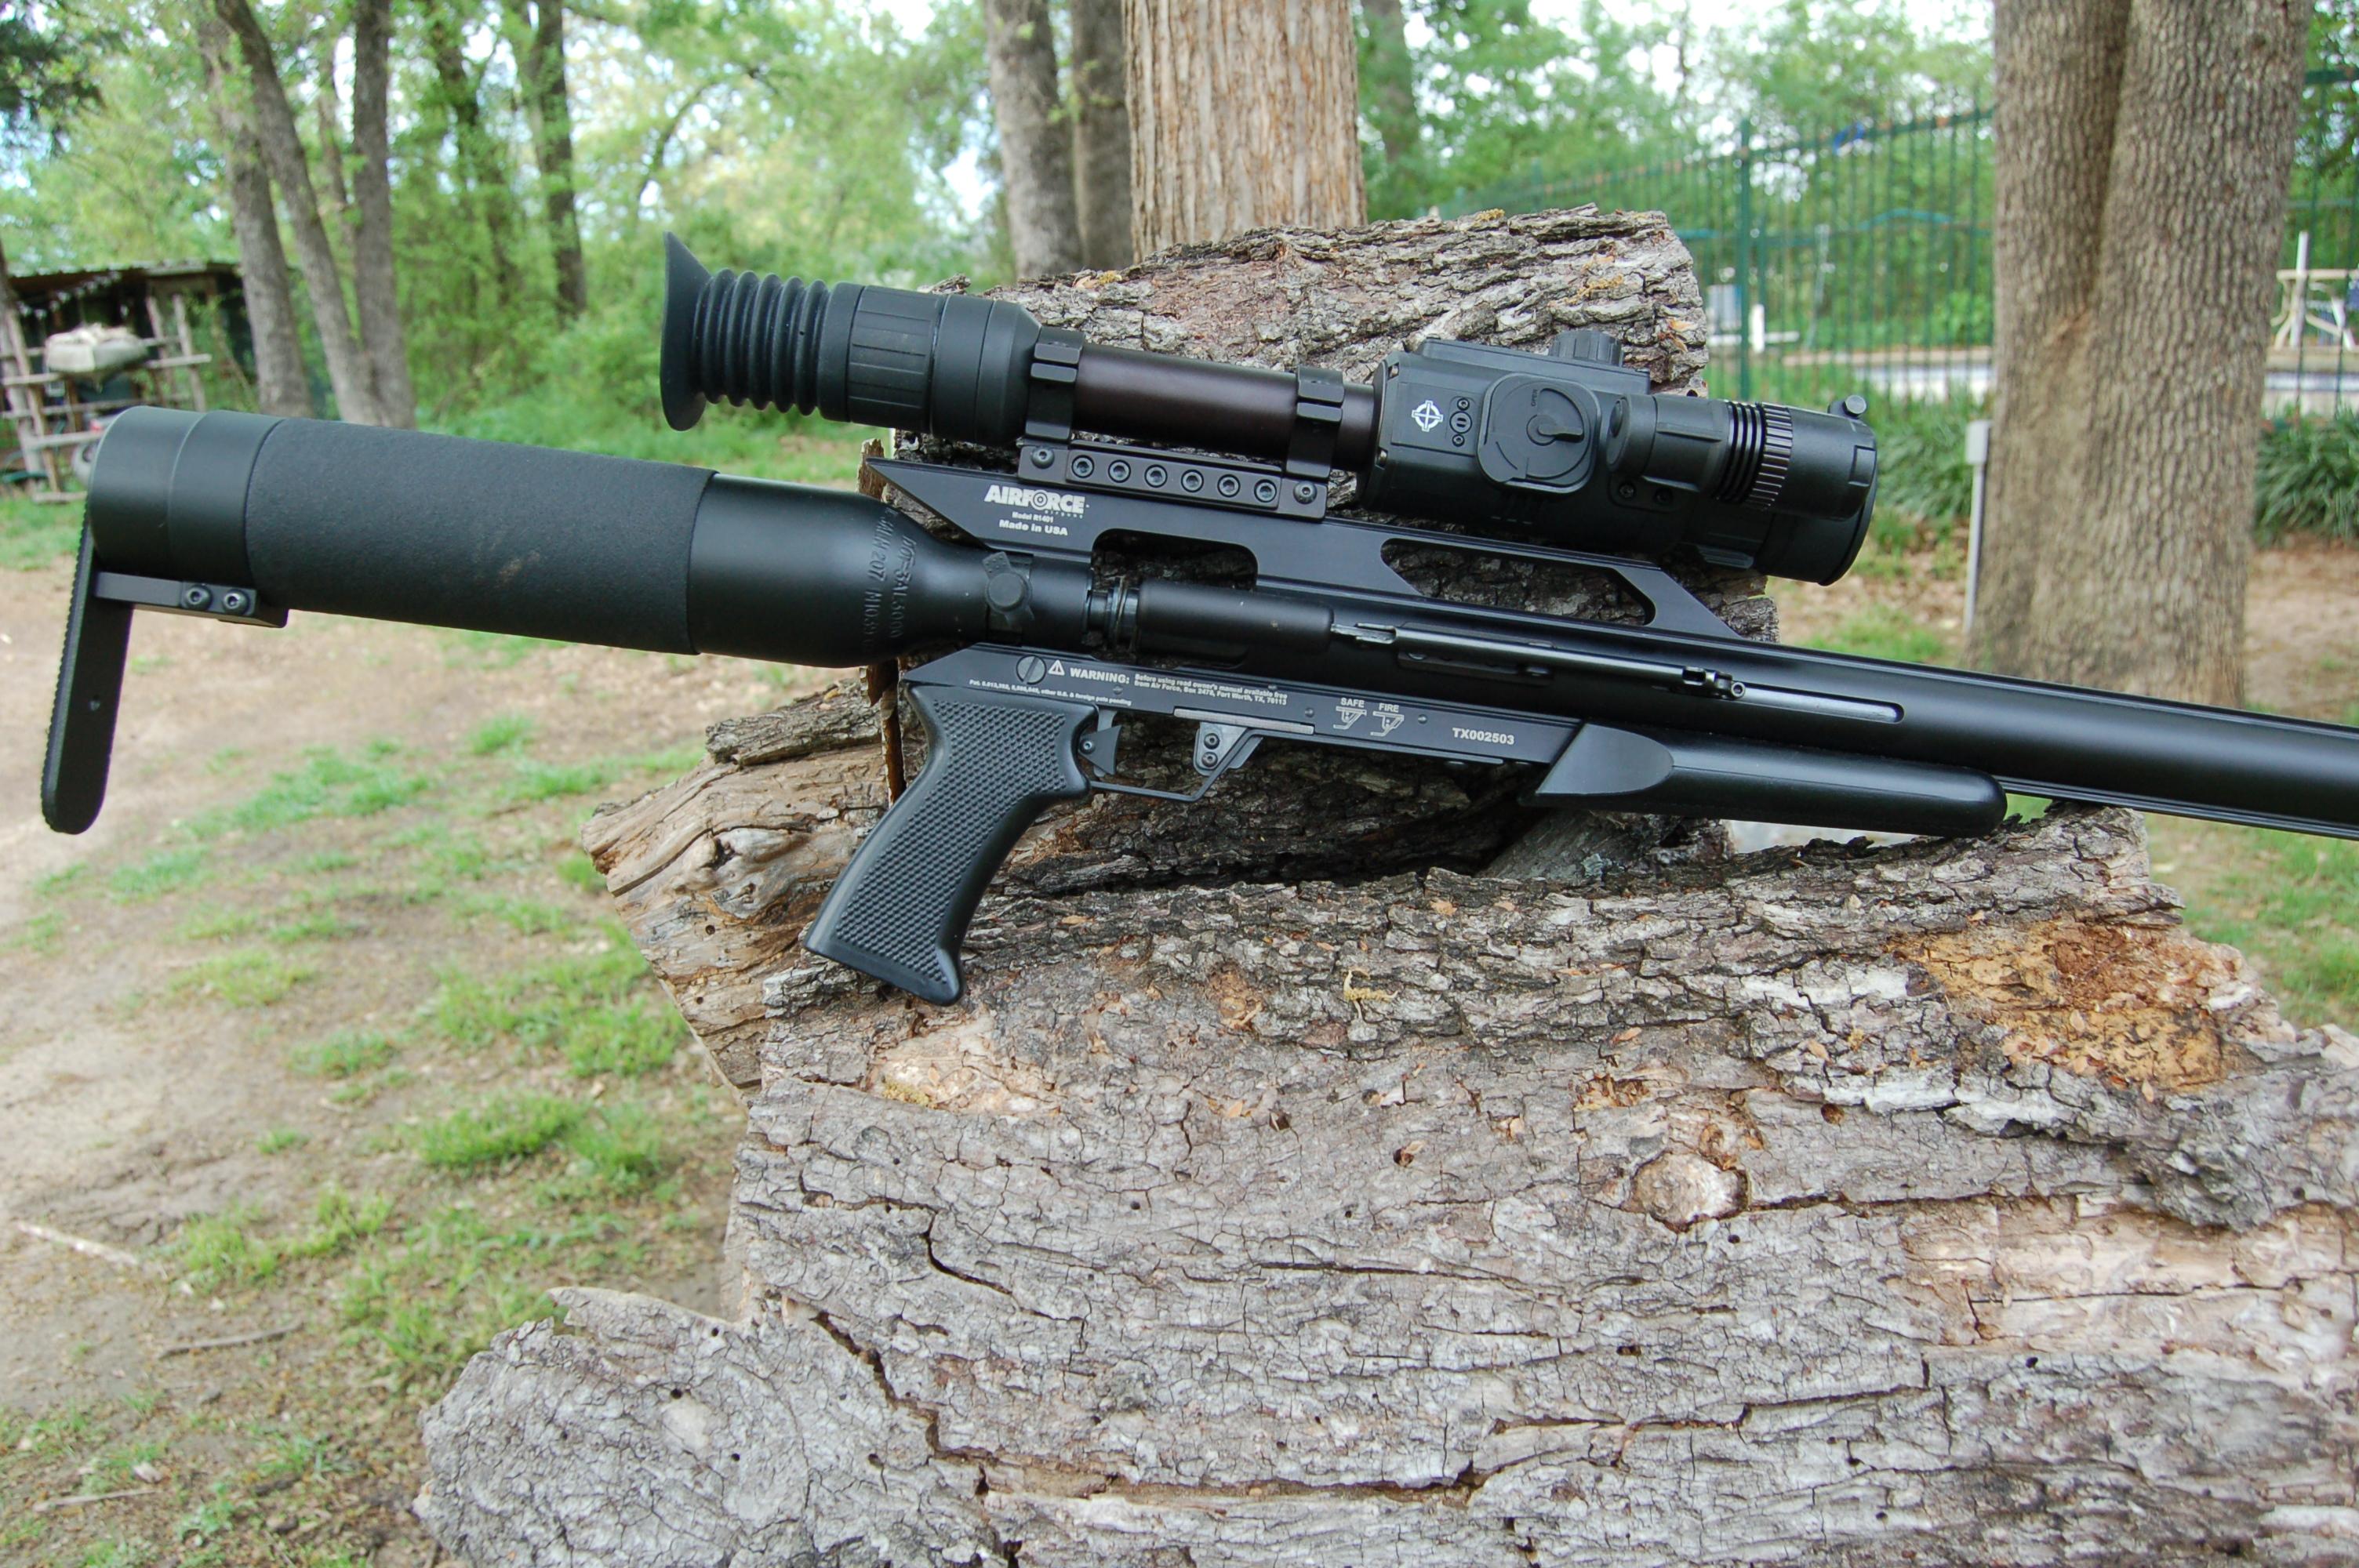 The New Big Bore Air Gun: Nothing Like the Old Pellet Gun We Grew Up